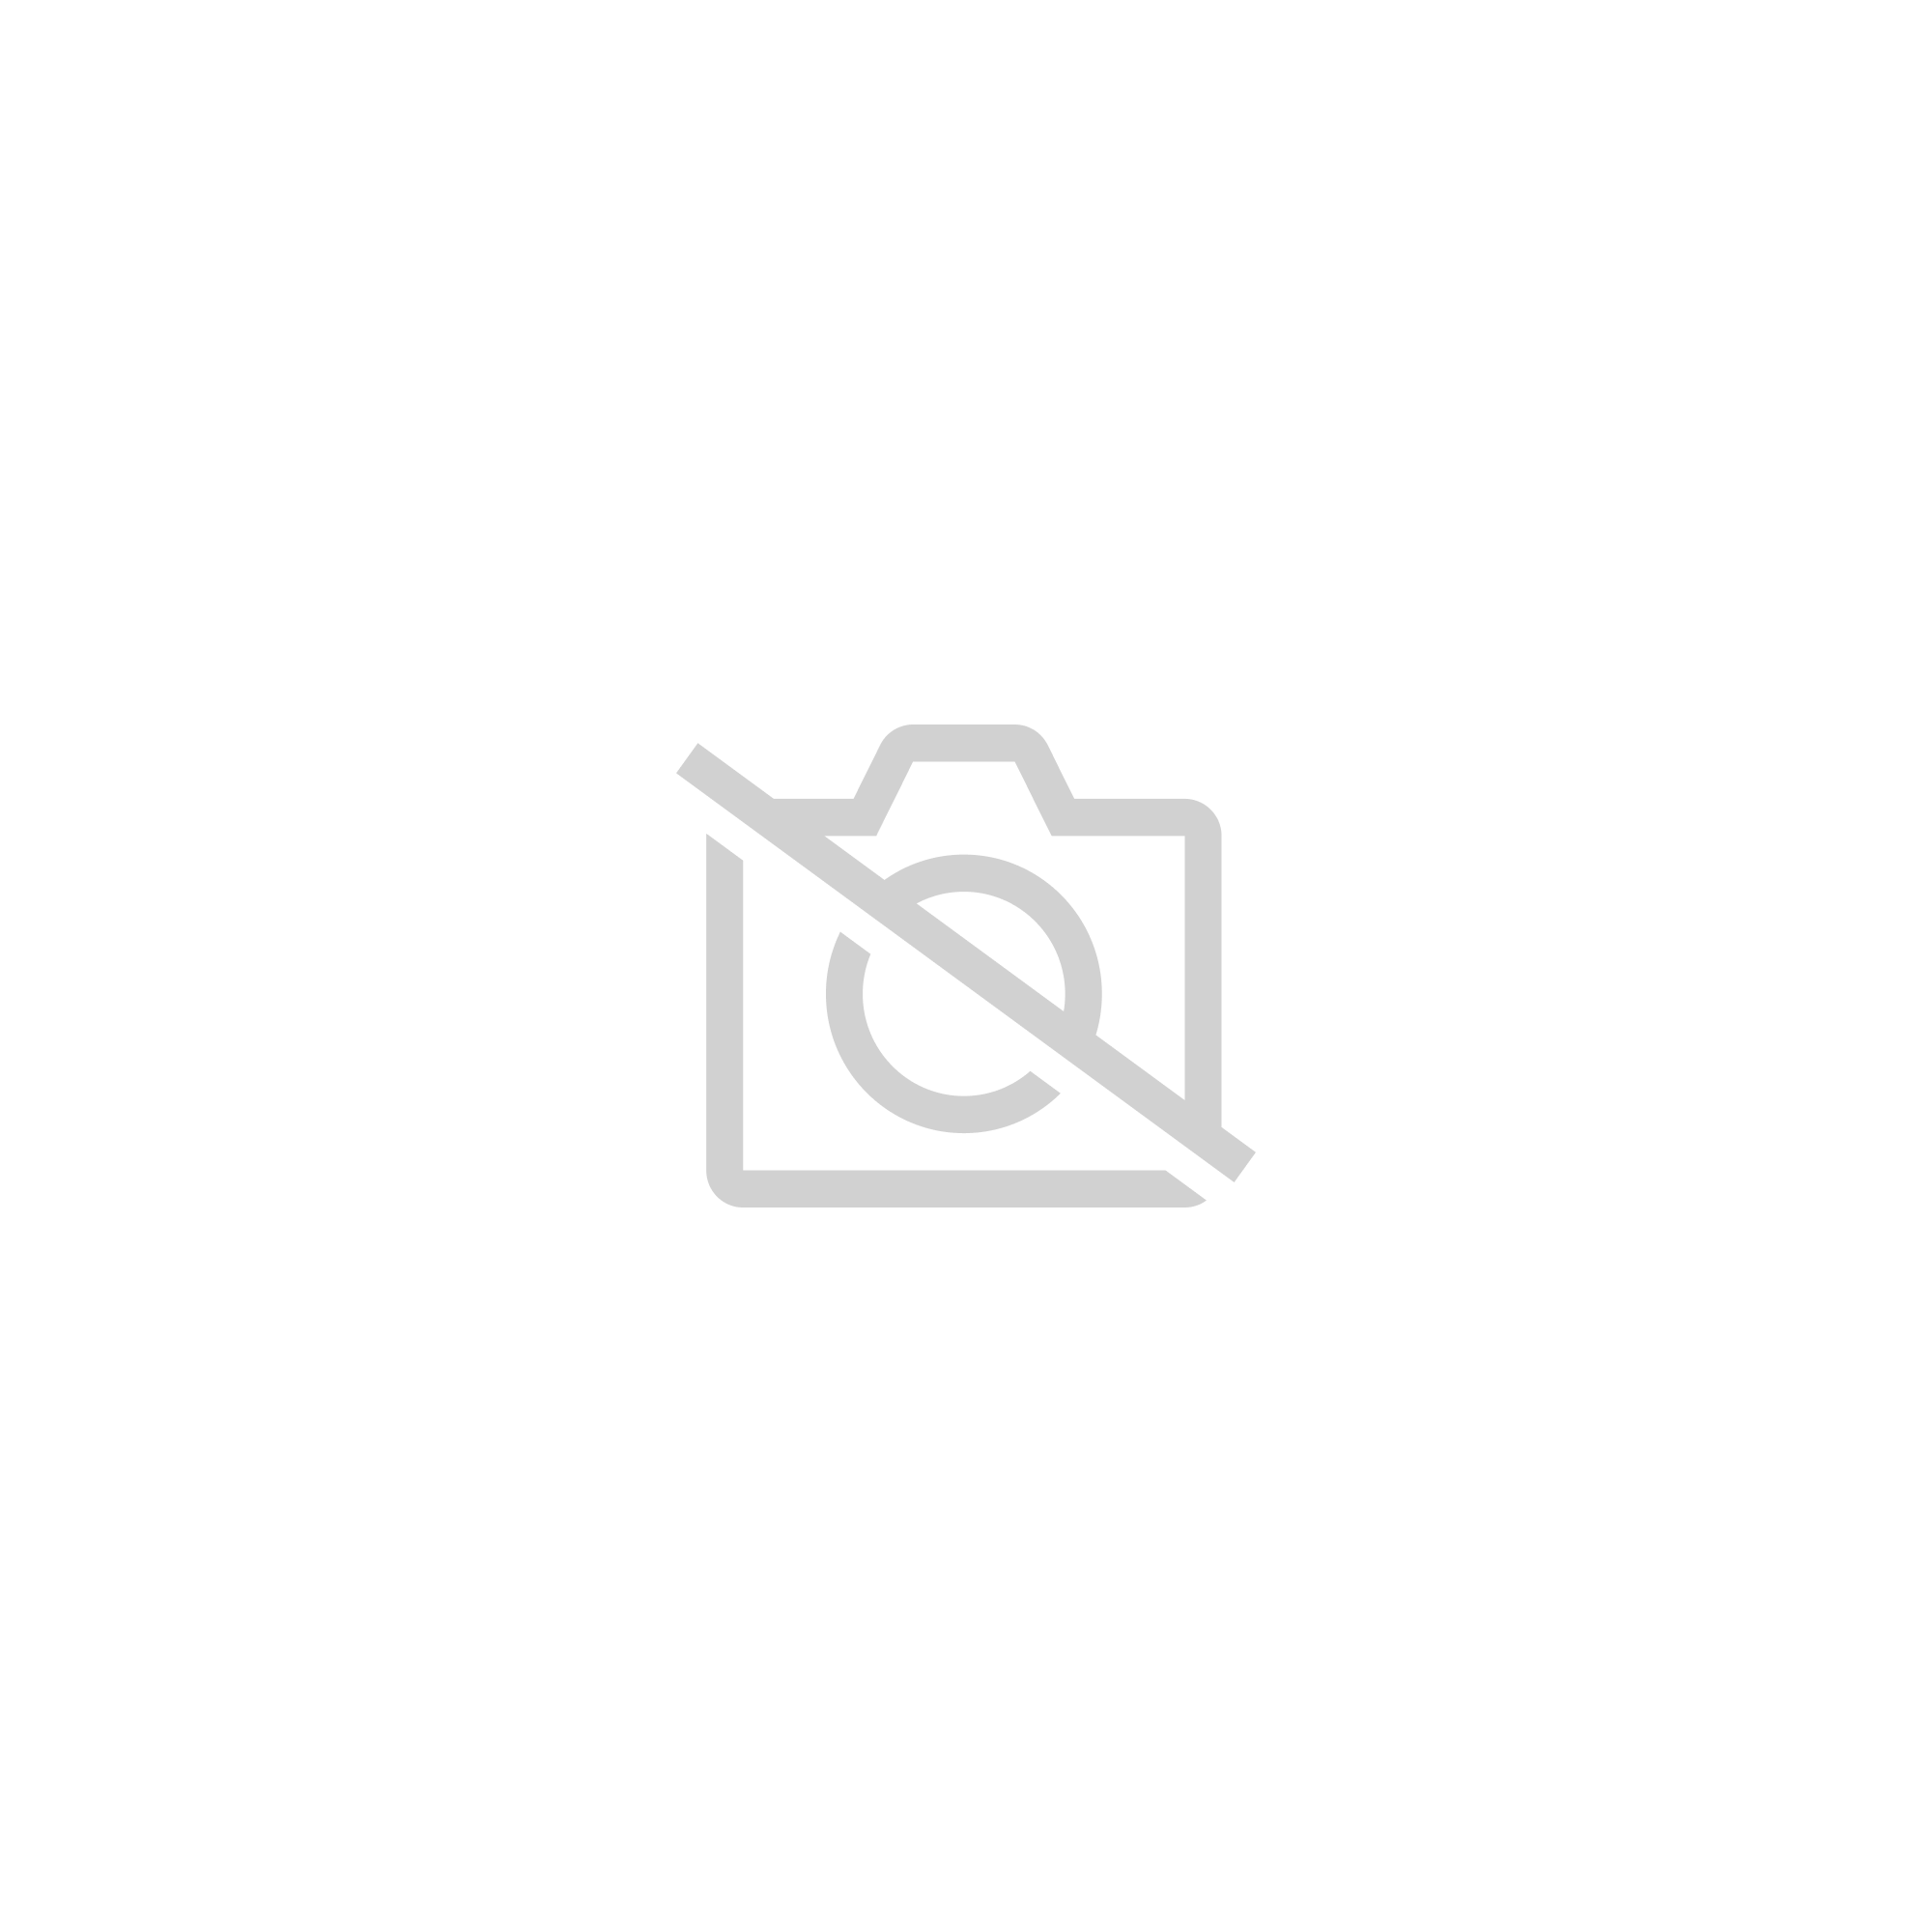 doudoune femme atlas for women Taille 38 | Rakuten